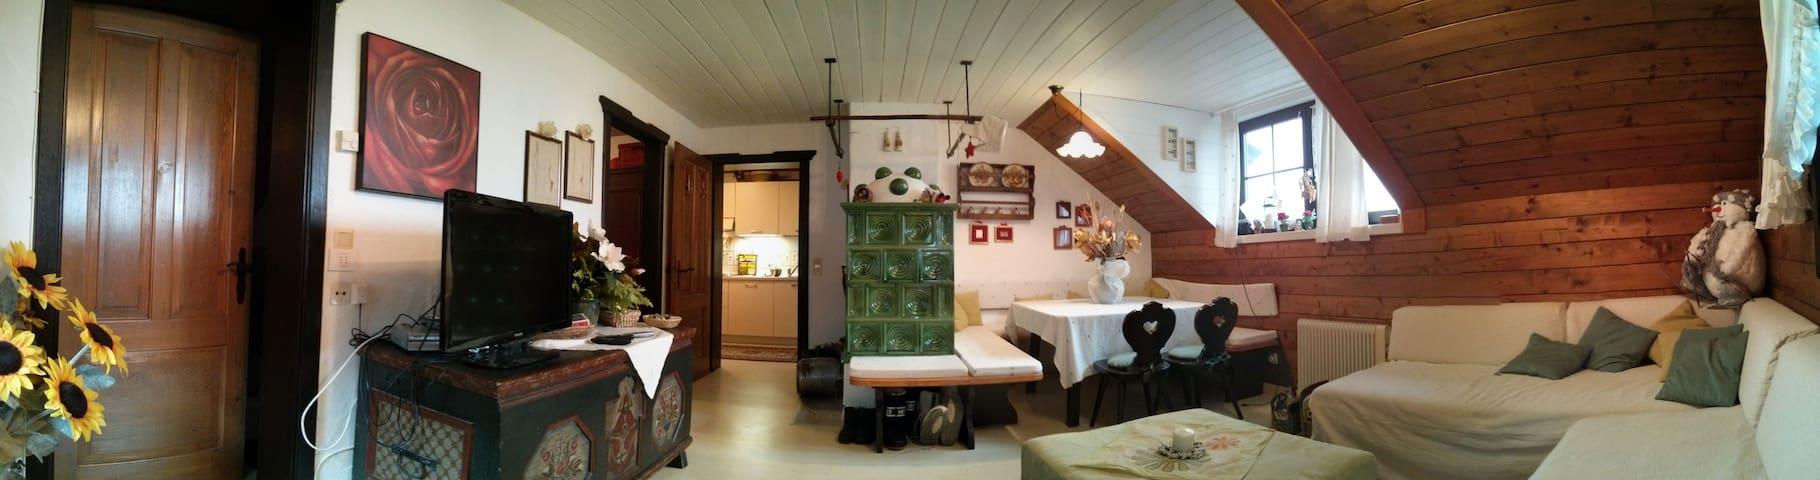 Nassfeld nest - Hermagor - Apartmen